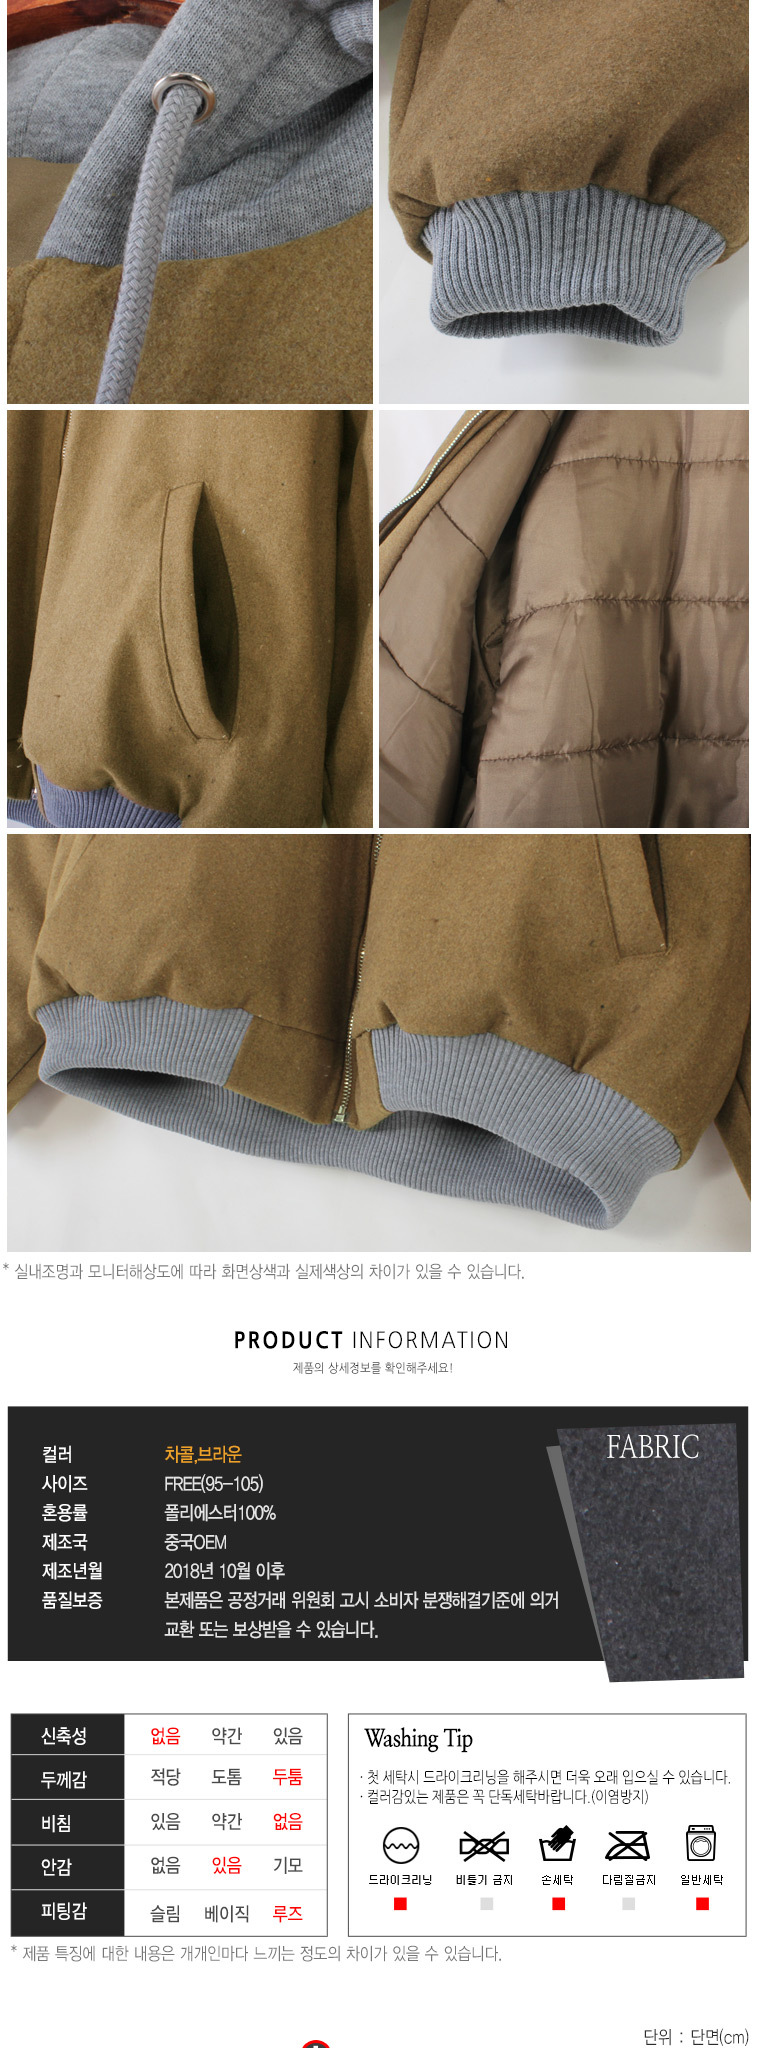 5301b83b9b0 ... 심야특가] 롱패딩/양털자켓/코트25% - 상세정보 ...